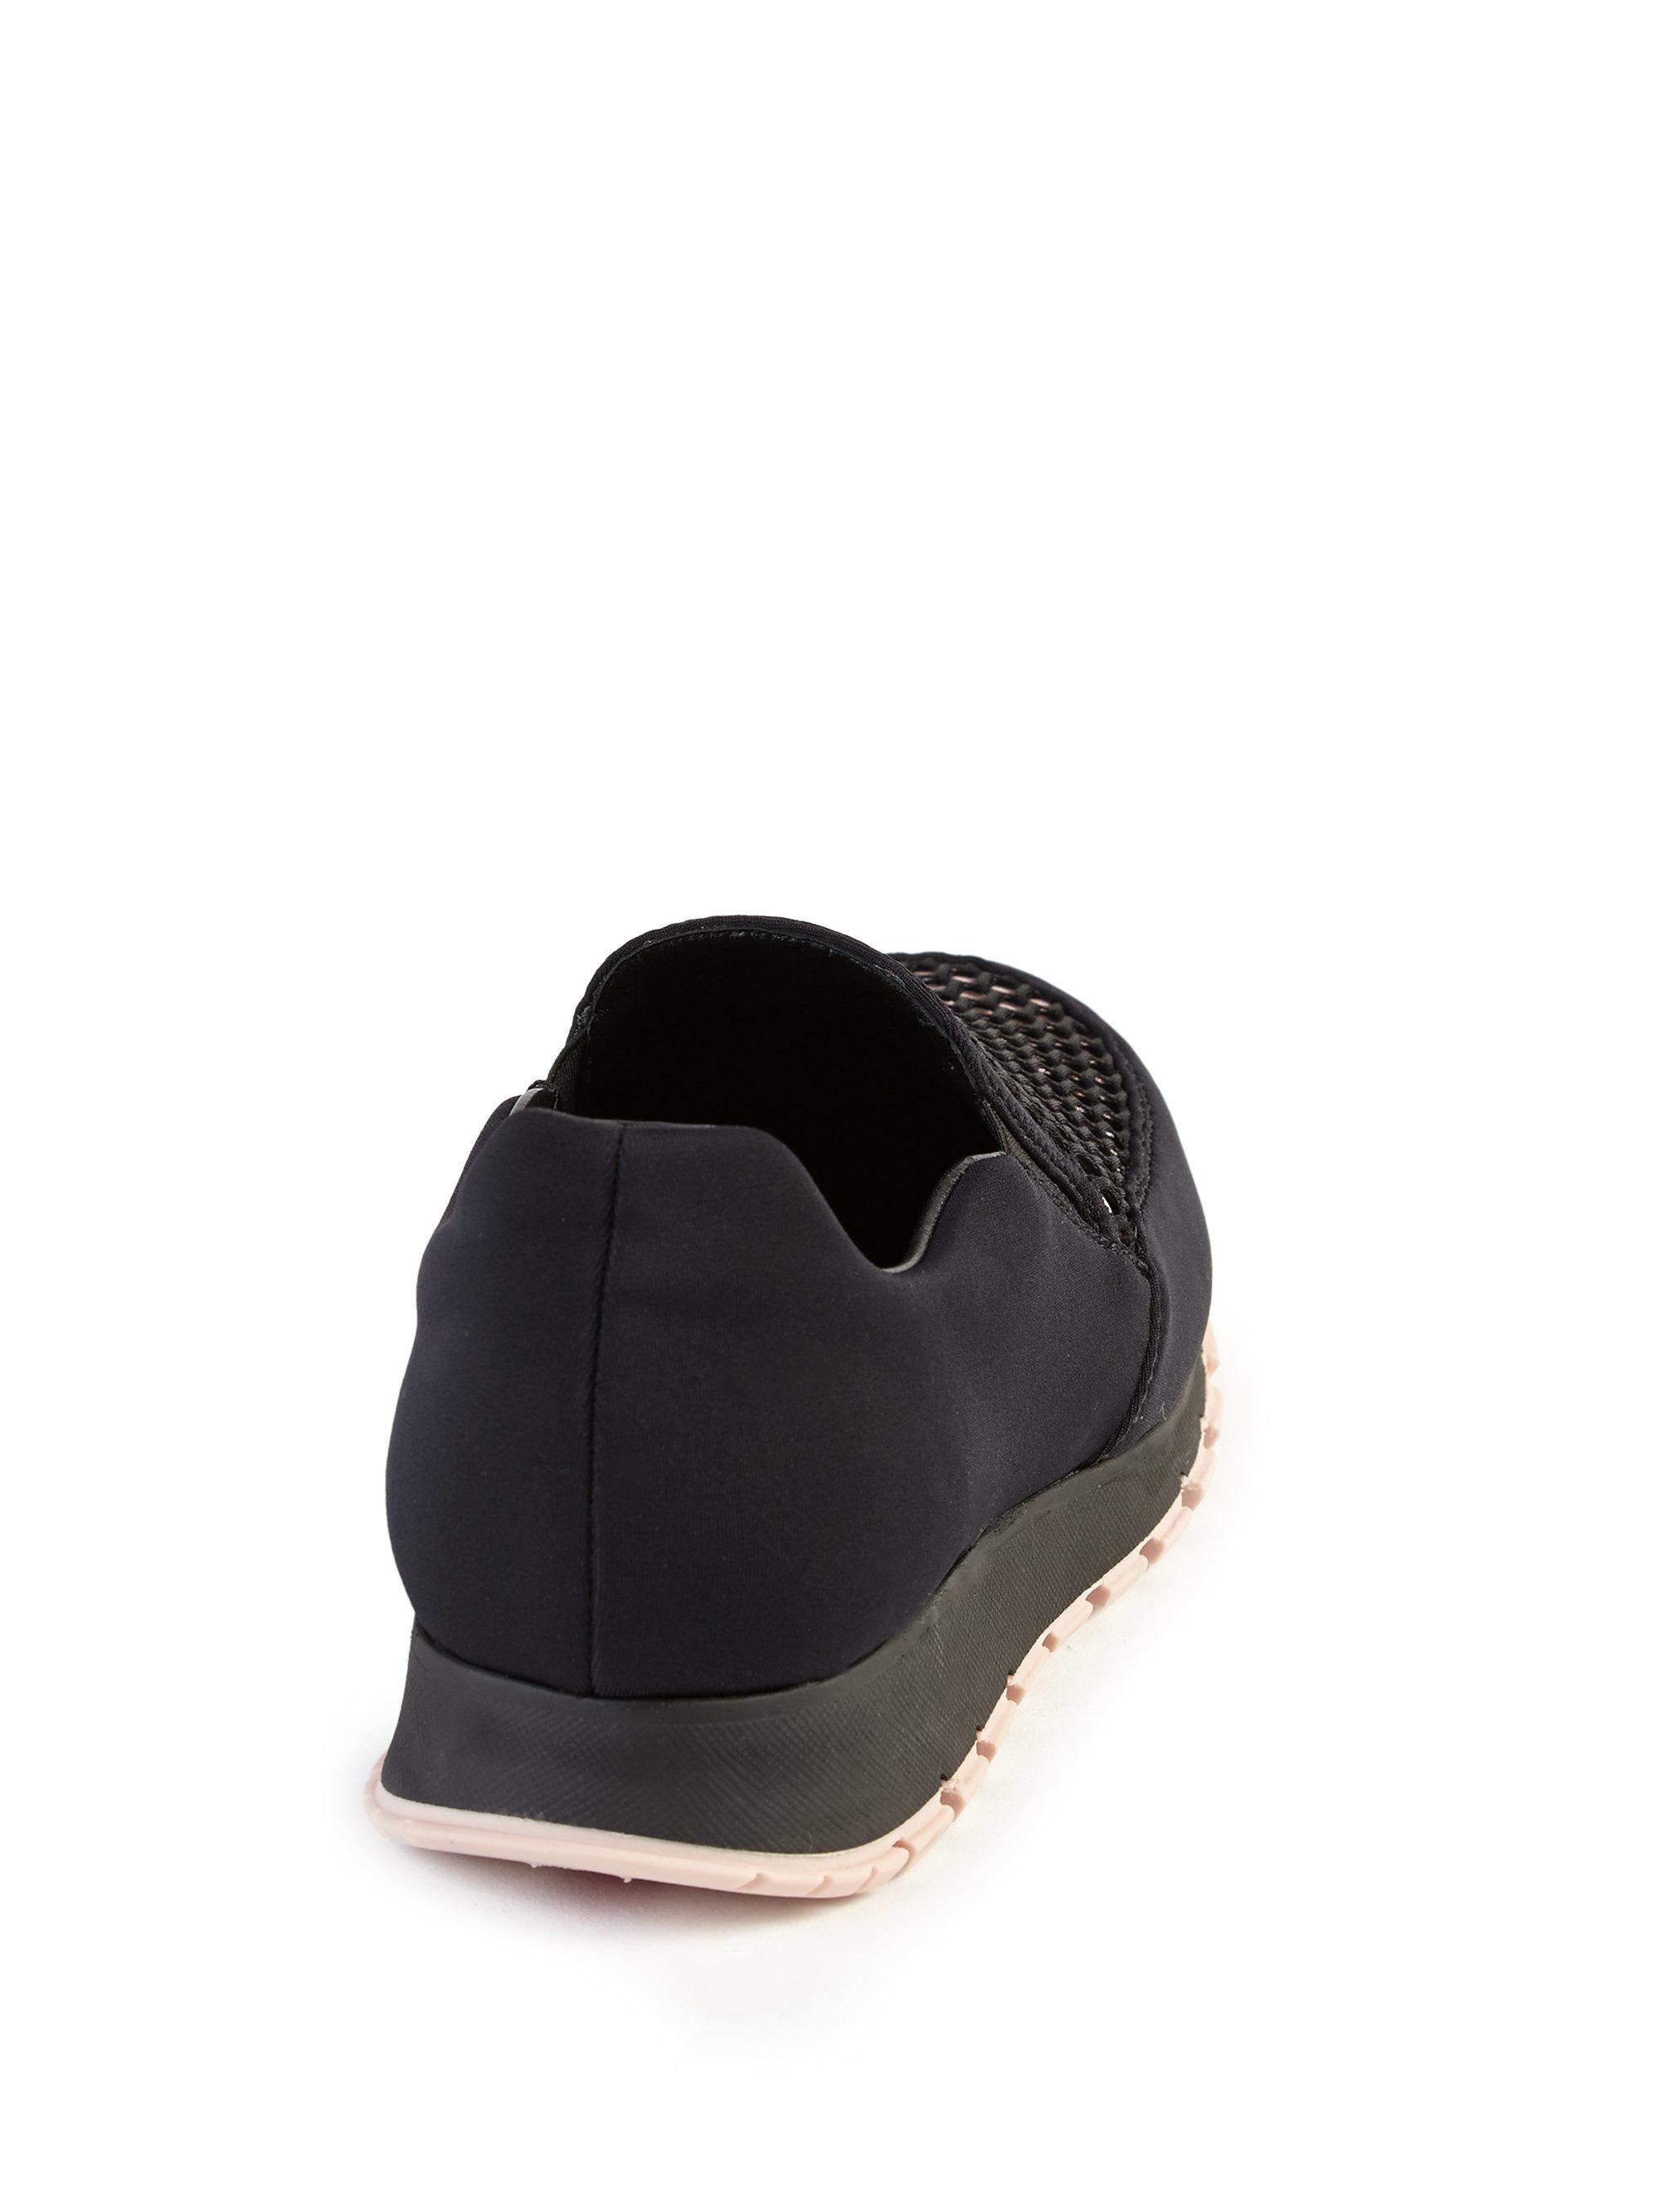 Prada Knit Slip-On Sneakers Arc2wl